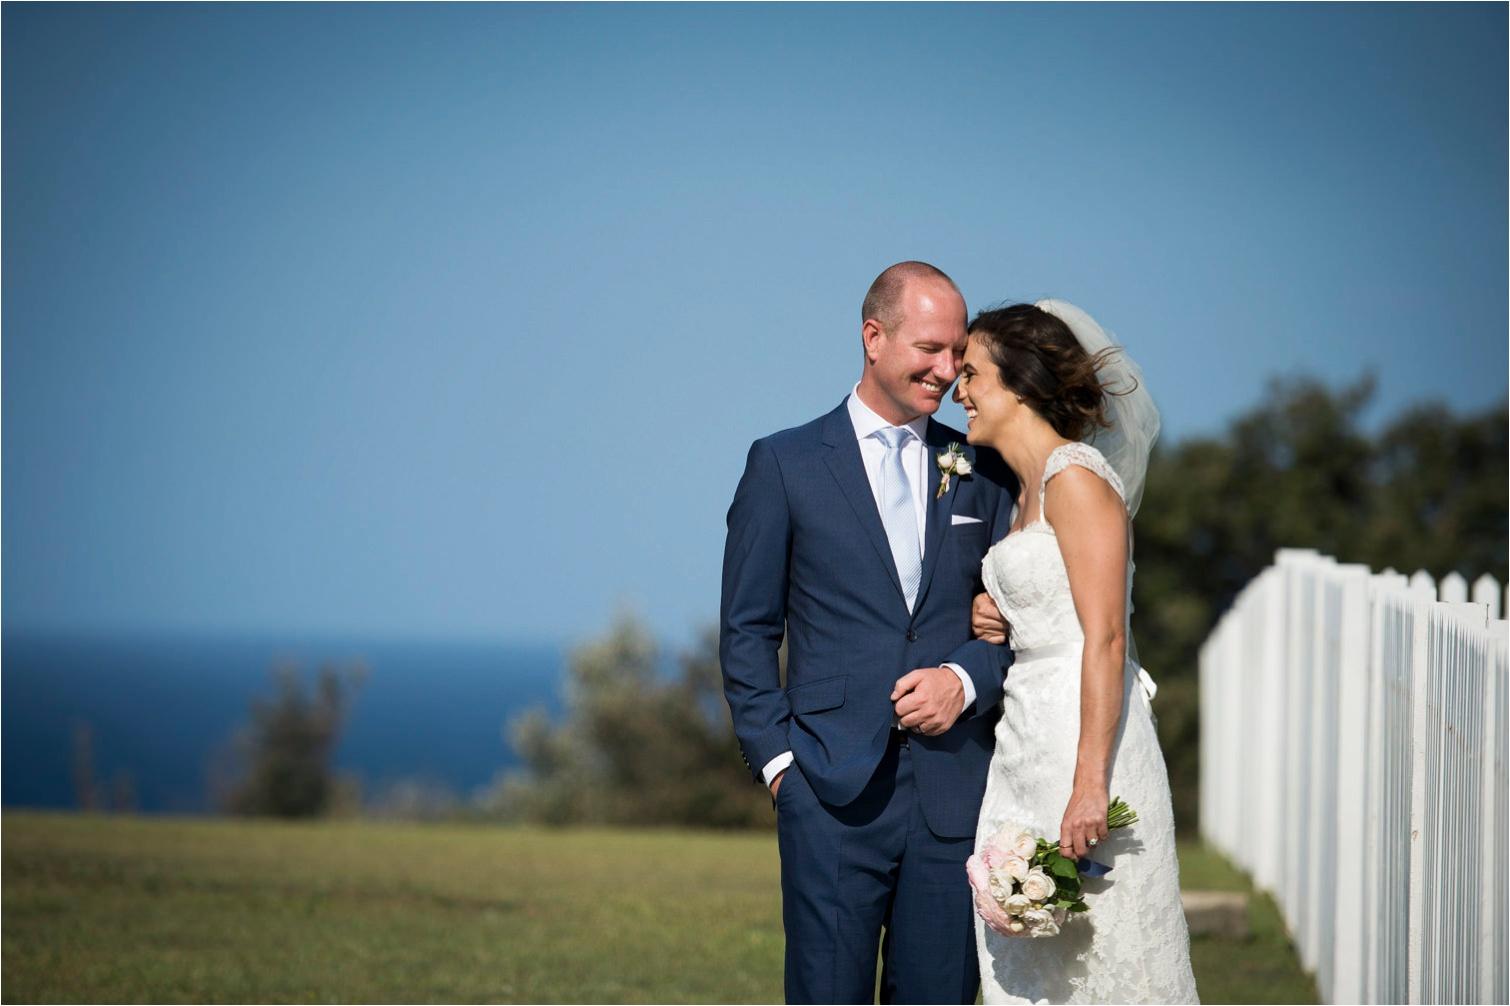 Nicole&Carlie_Watsons_Bay_Hotel_Wedding_by_Gold_Coast_Photographers-The_Follans28.jpg